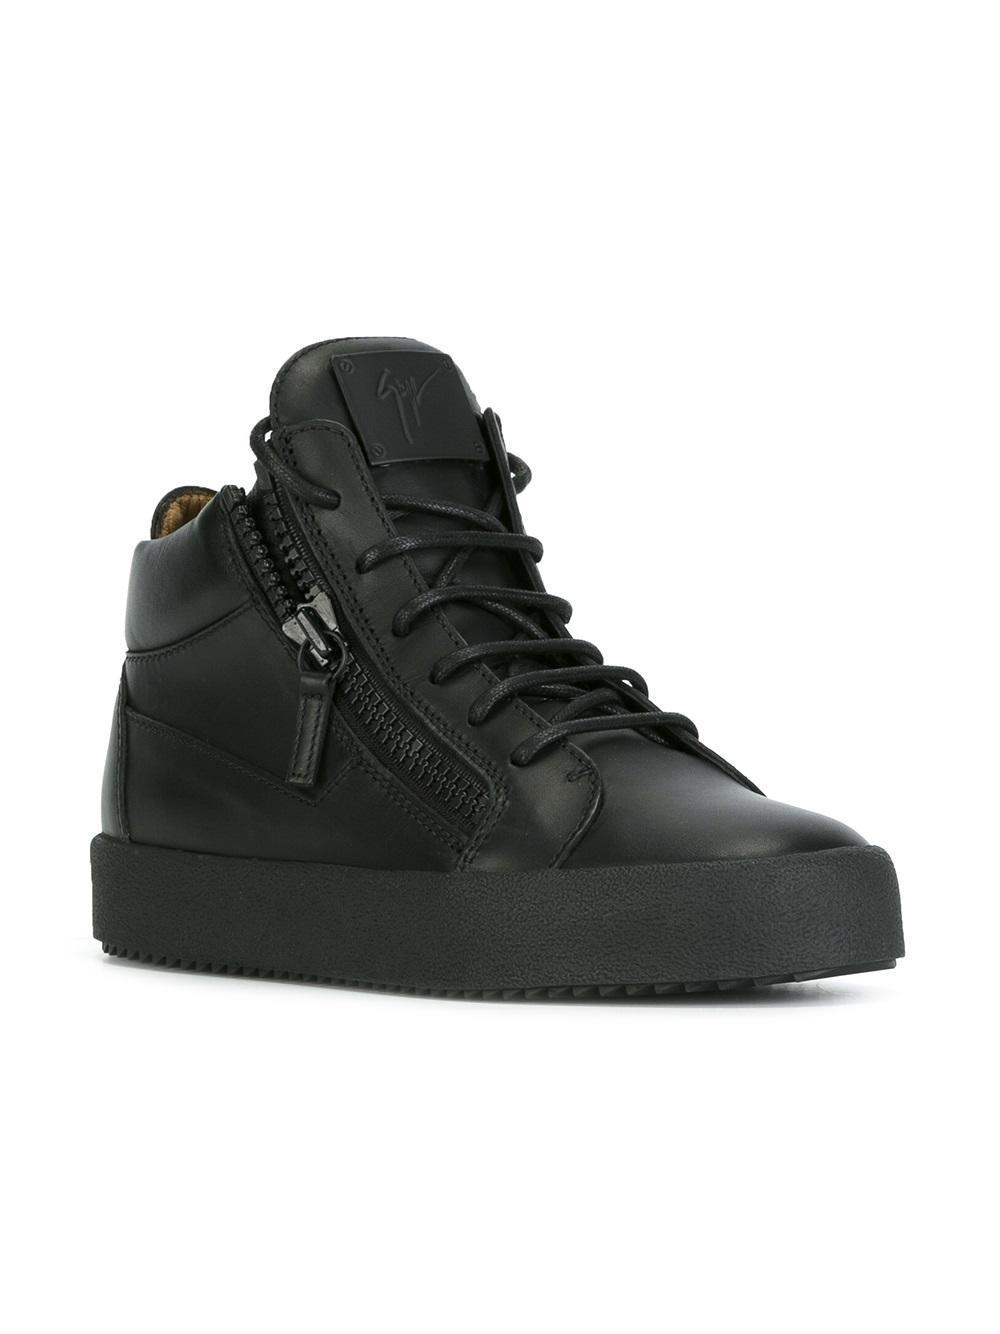 Giuseppe Zanotti Leather Kriss Hi Top Sneakers In Black